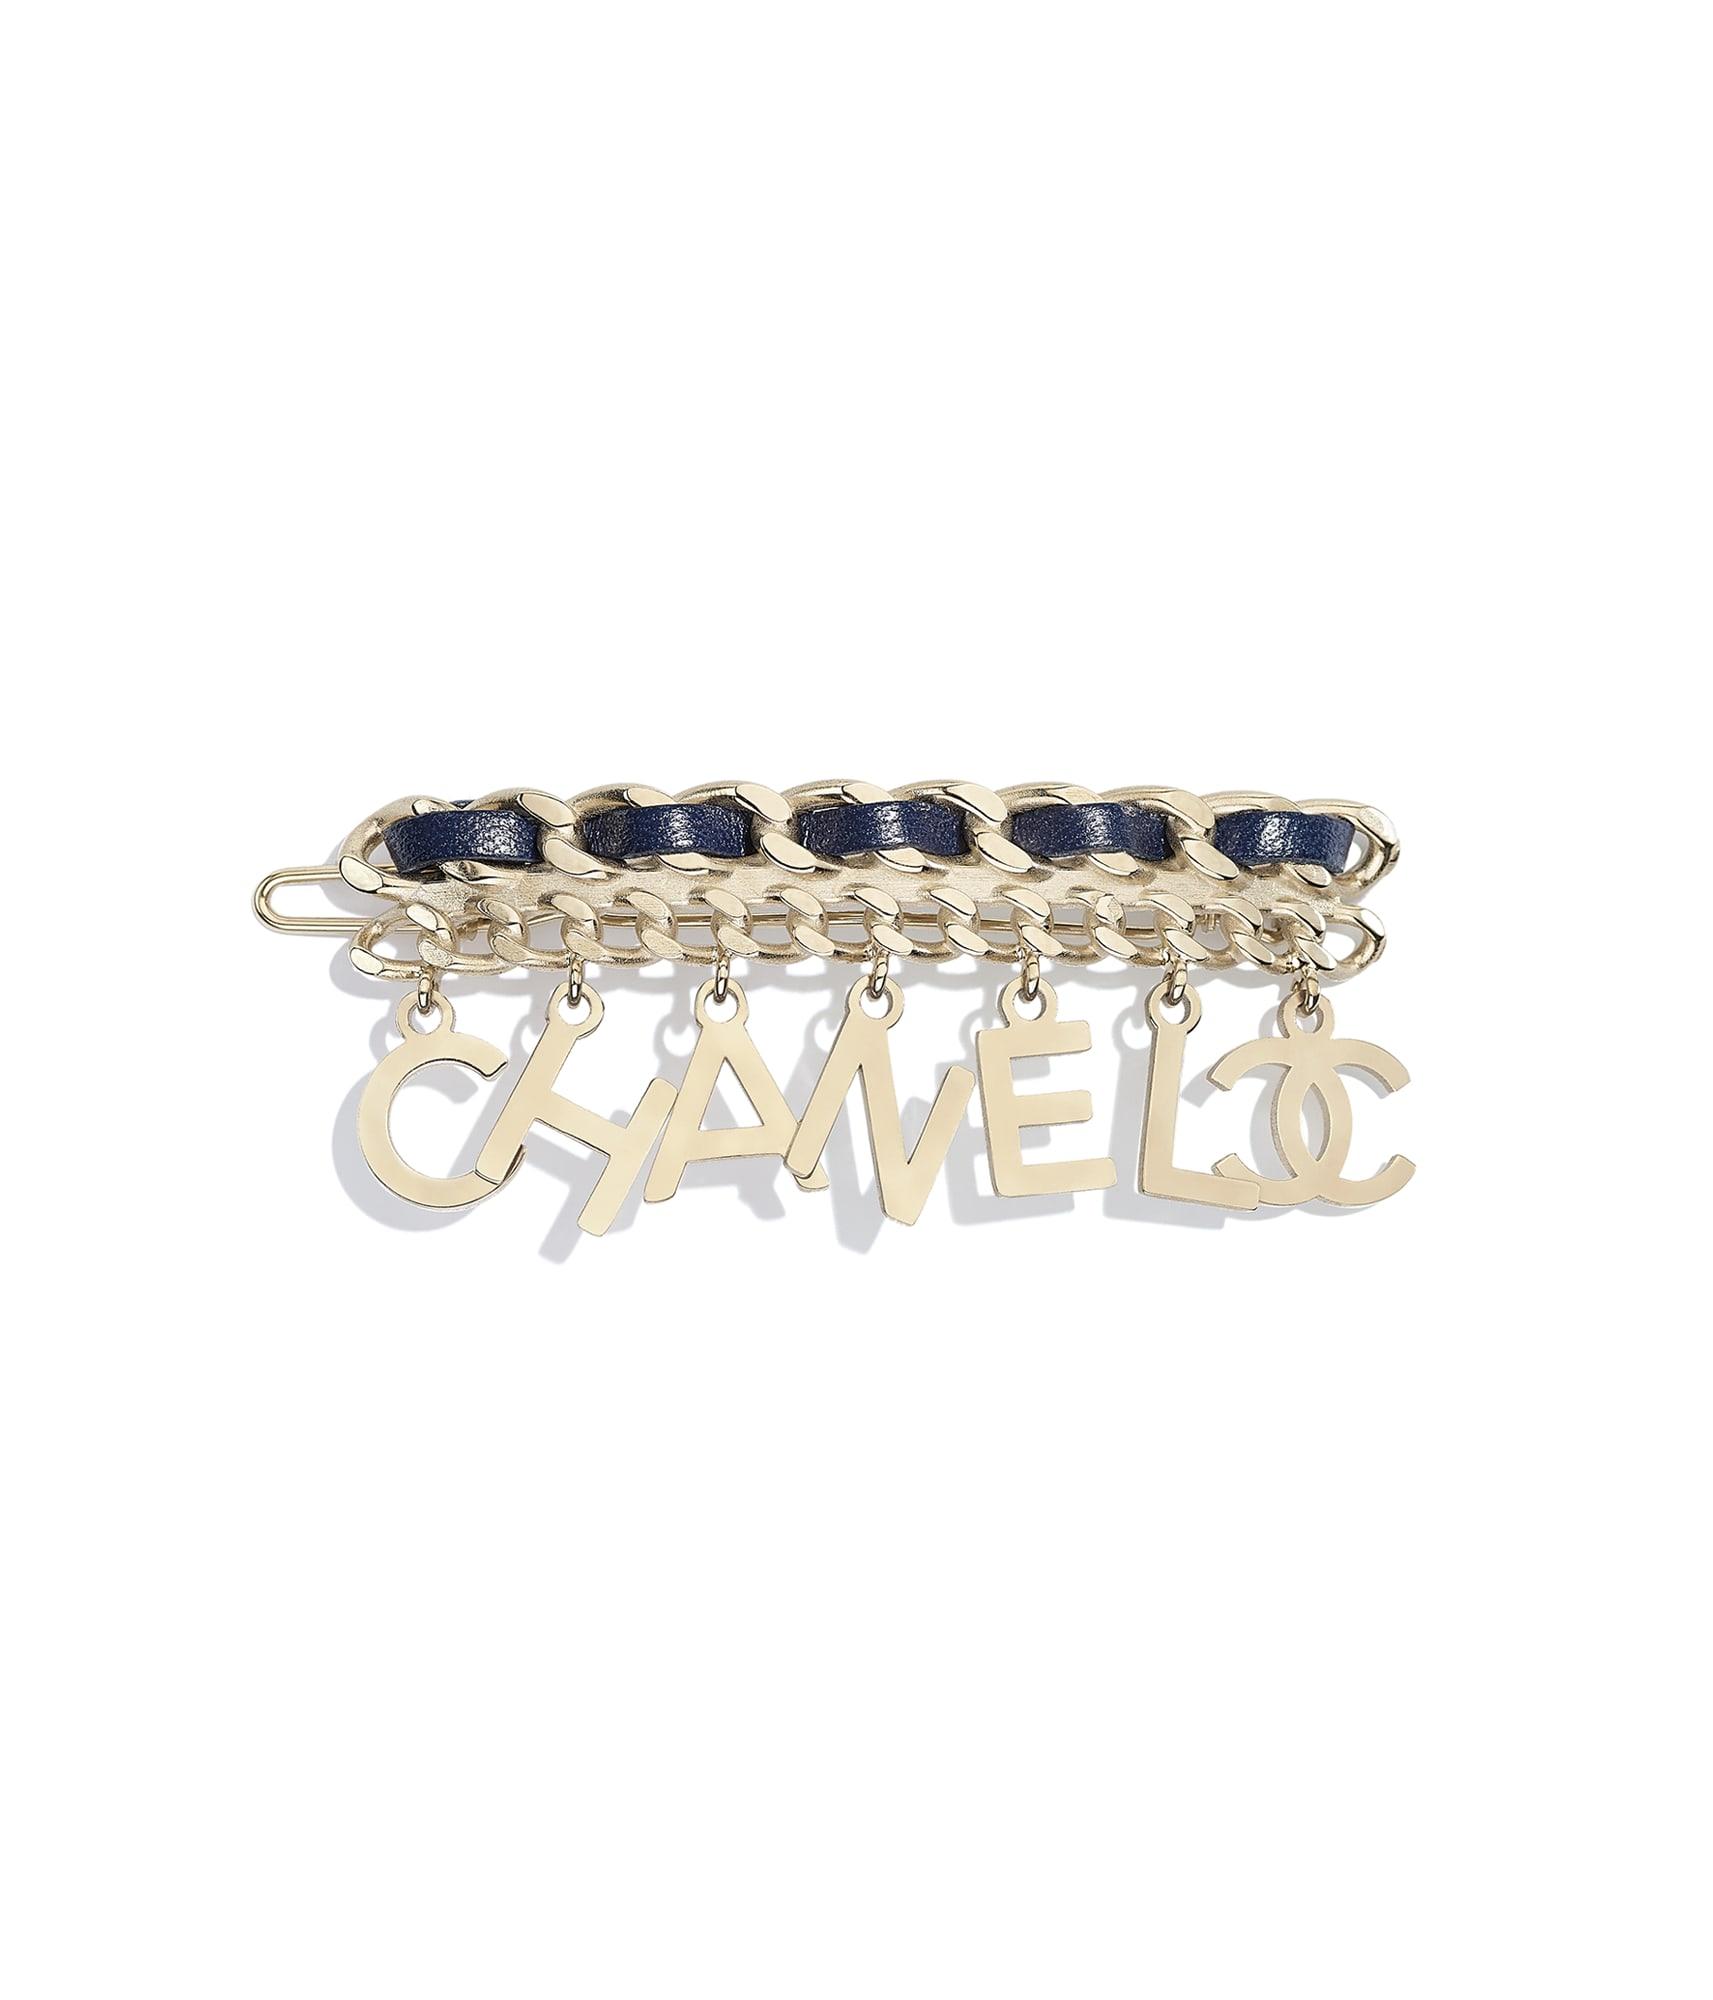 731f4781b Hair Accessory, metal & calfskin, gold & blue - CHANEL